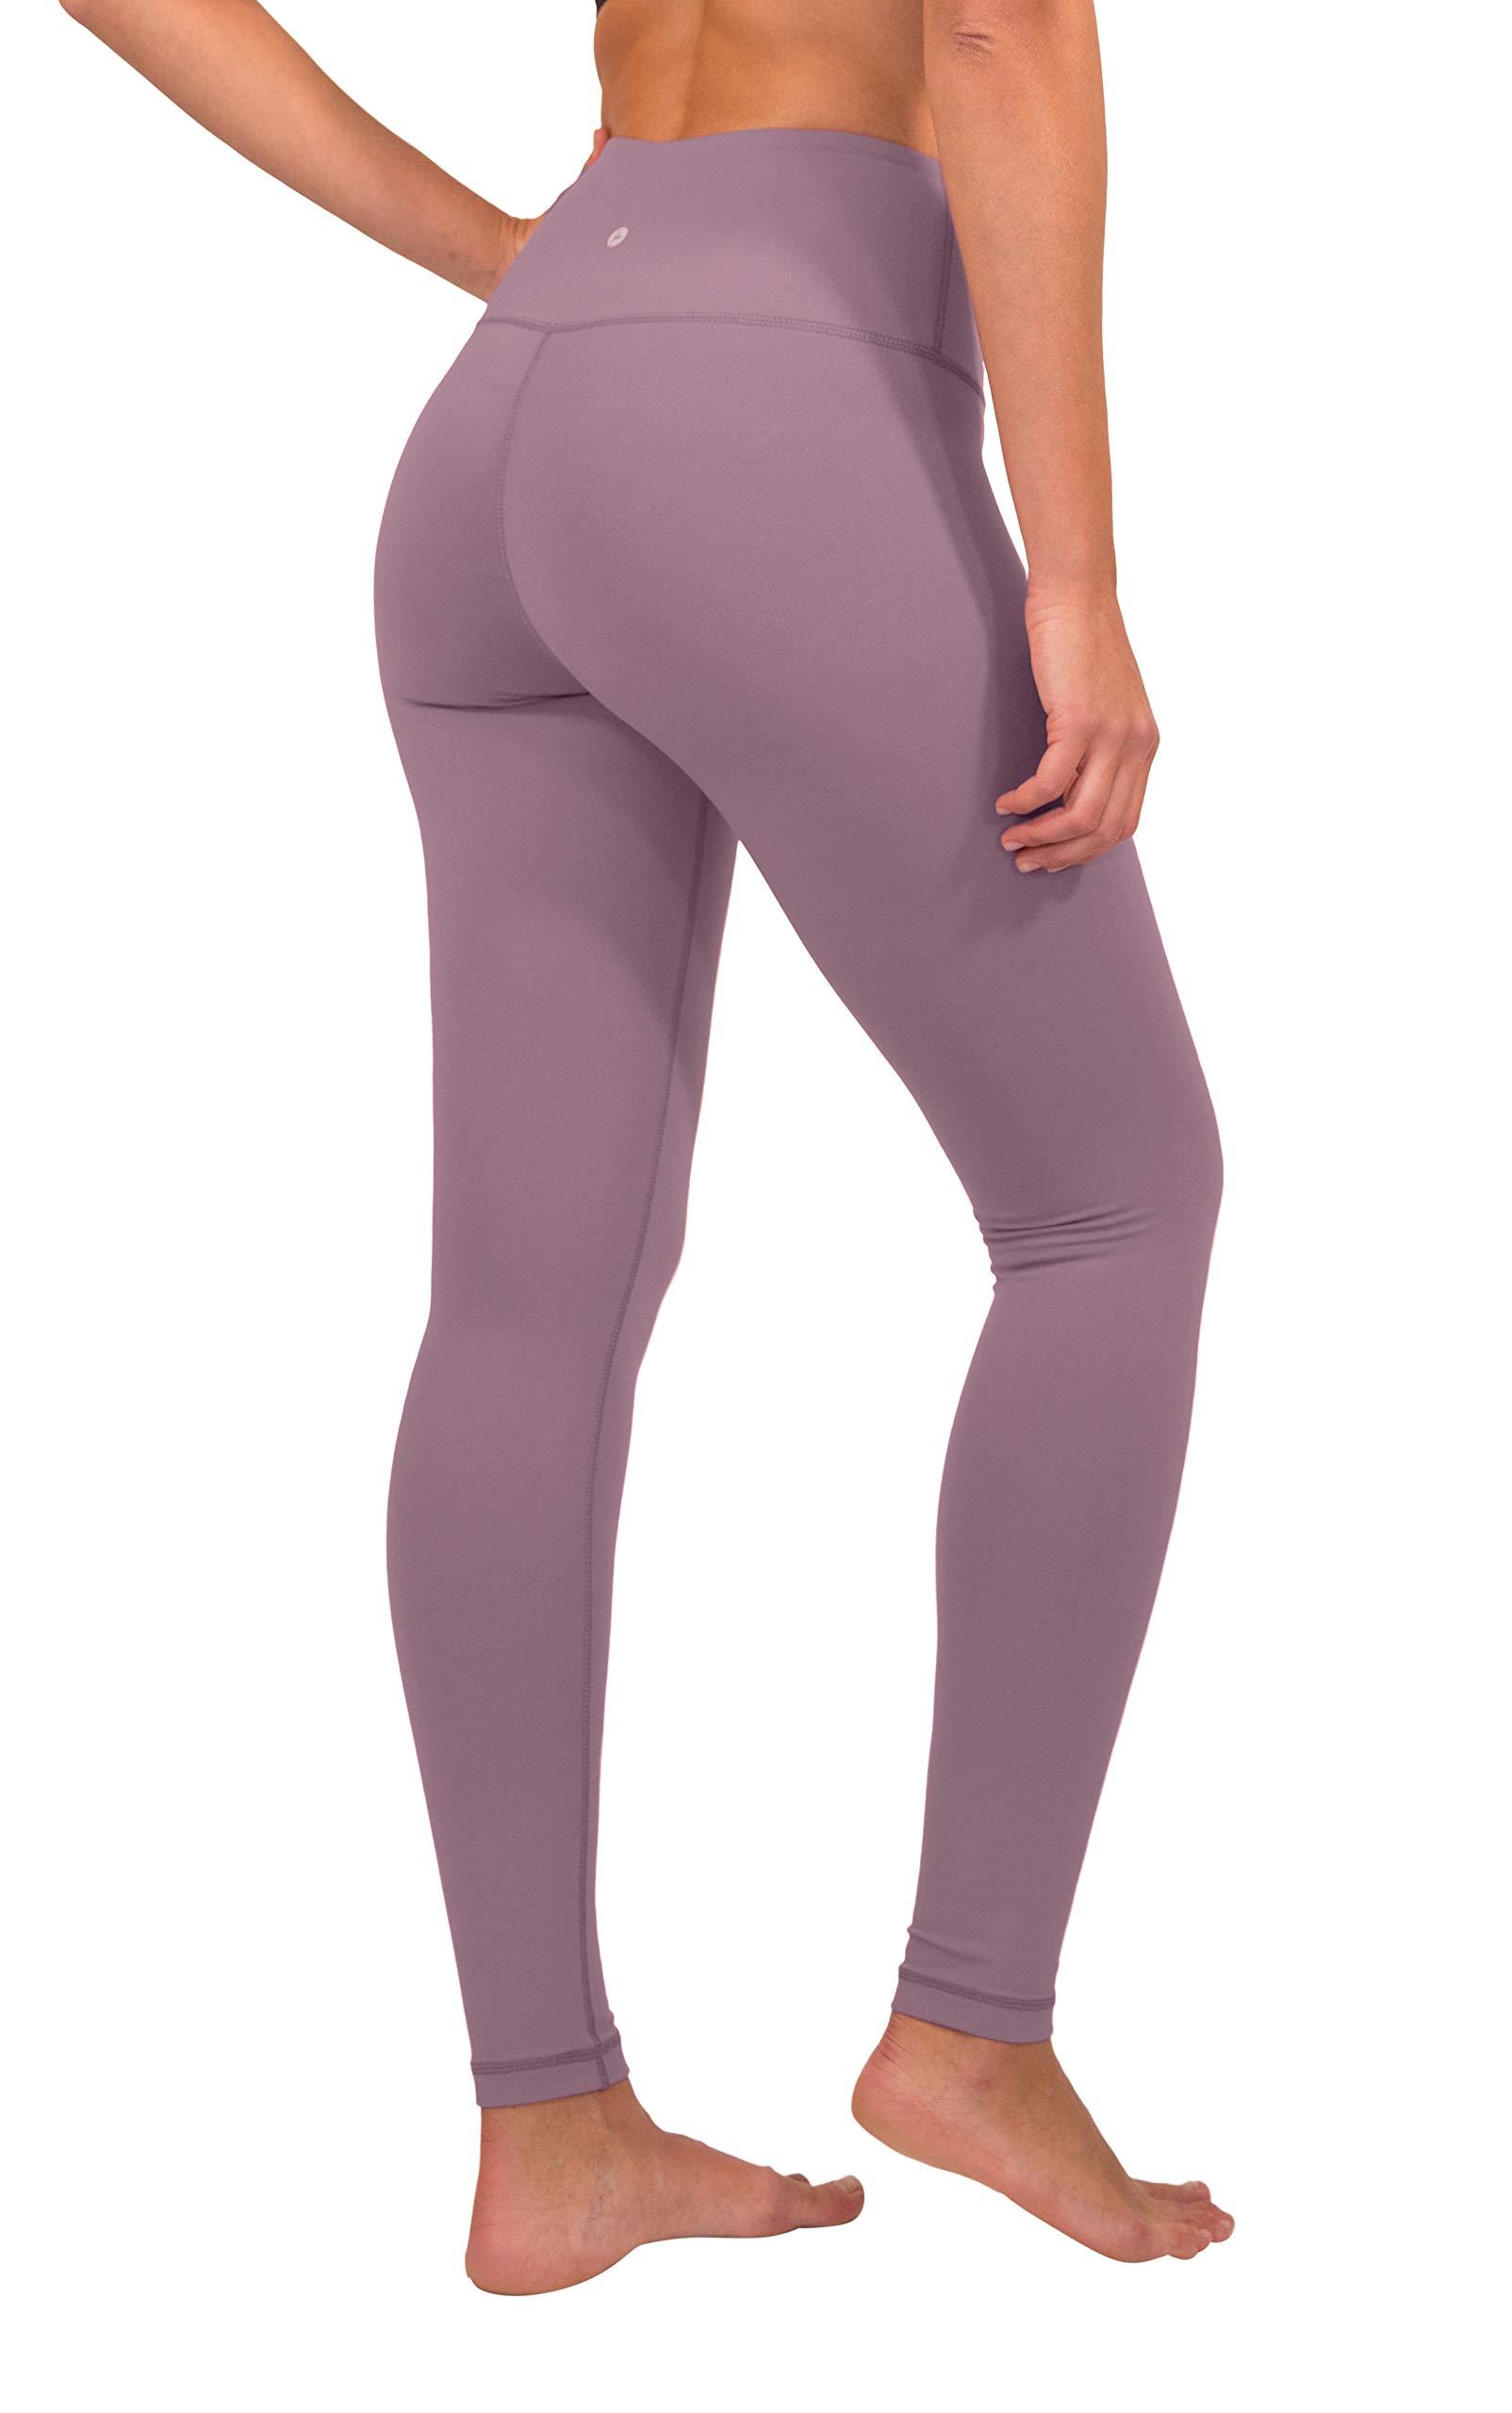 90 Degree By Reflex - High Waist Power Flex Legging – Tummy Control - Chocolate Plum - Small by 90 Degree By Reflex (Image #3)